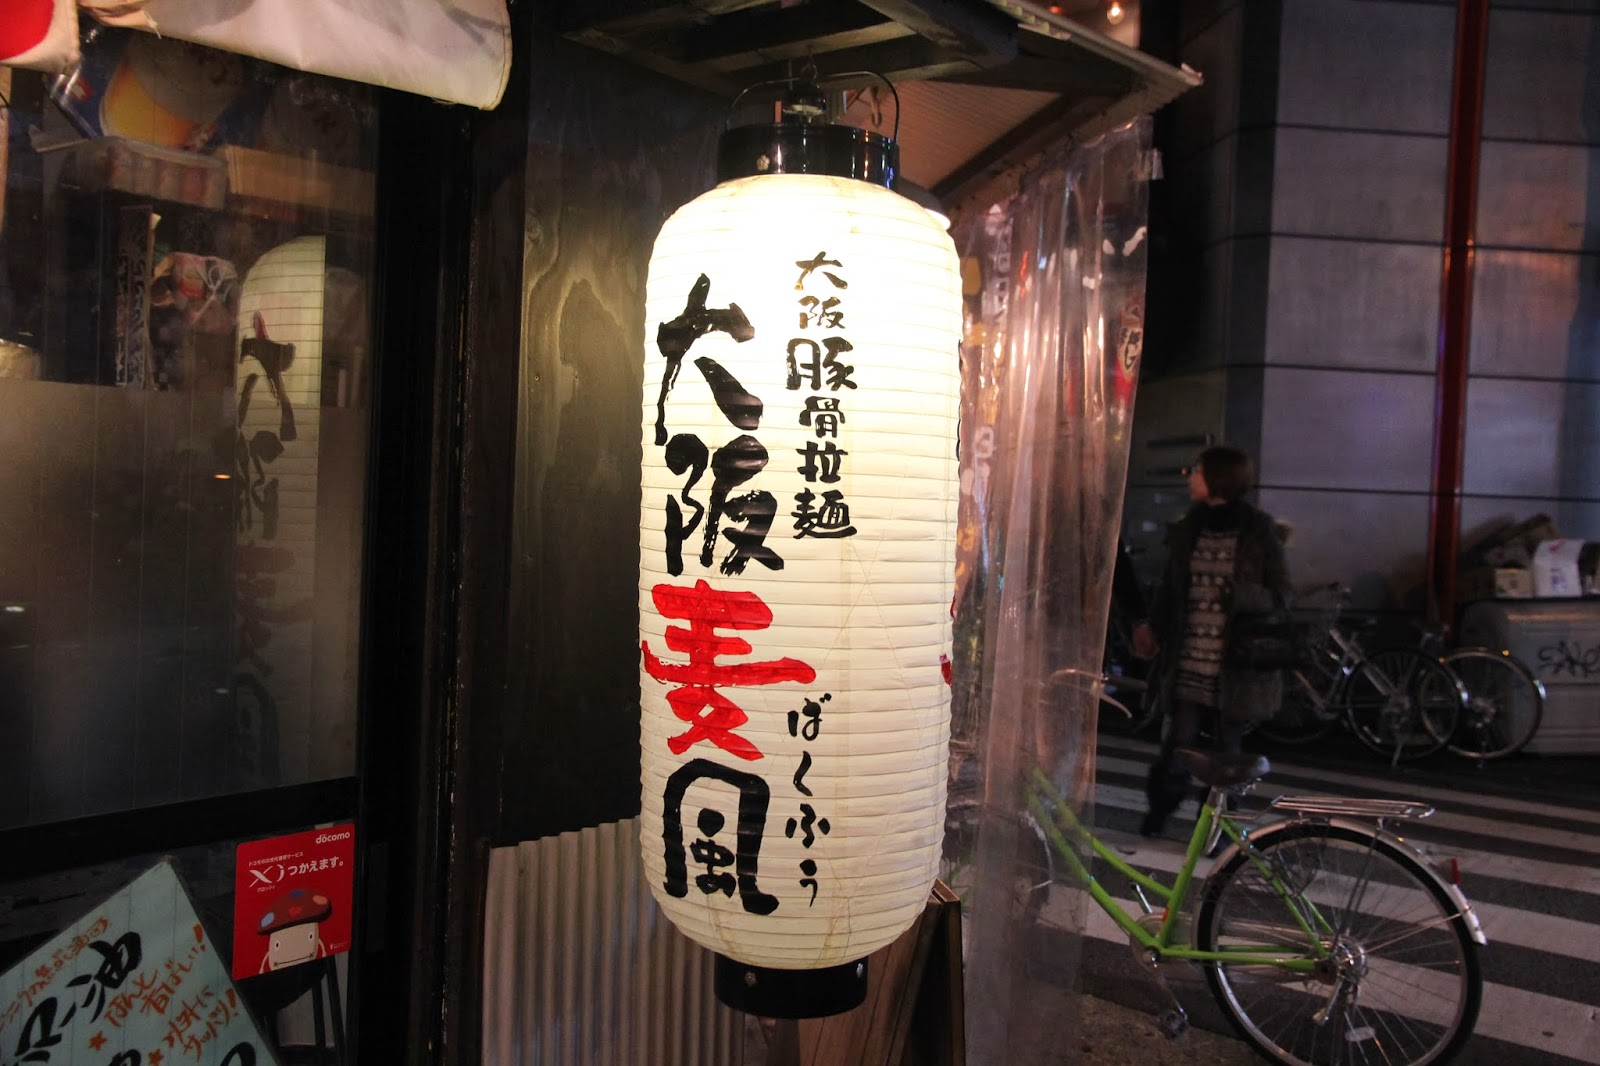 DAY4-12,サッカーショップKAMO 心斎橋店